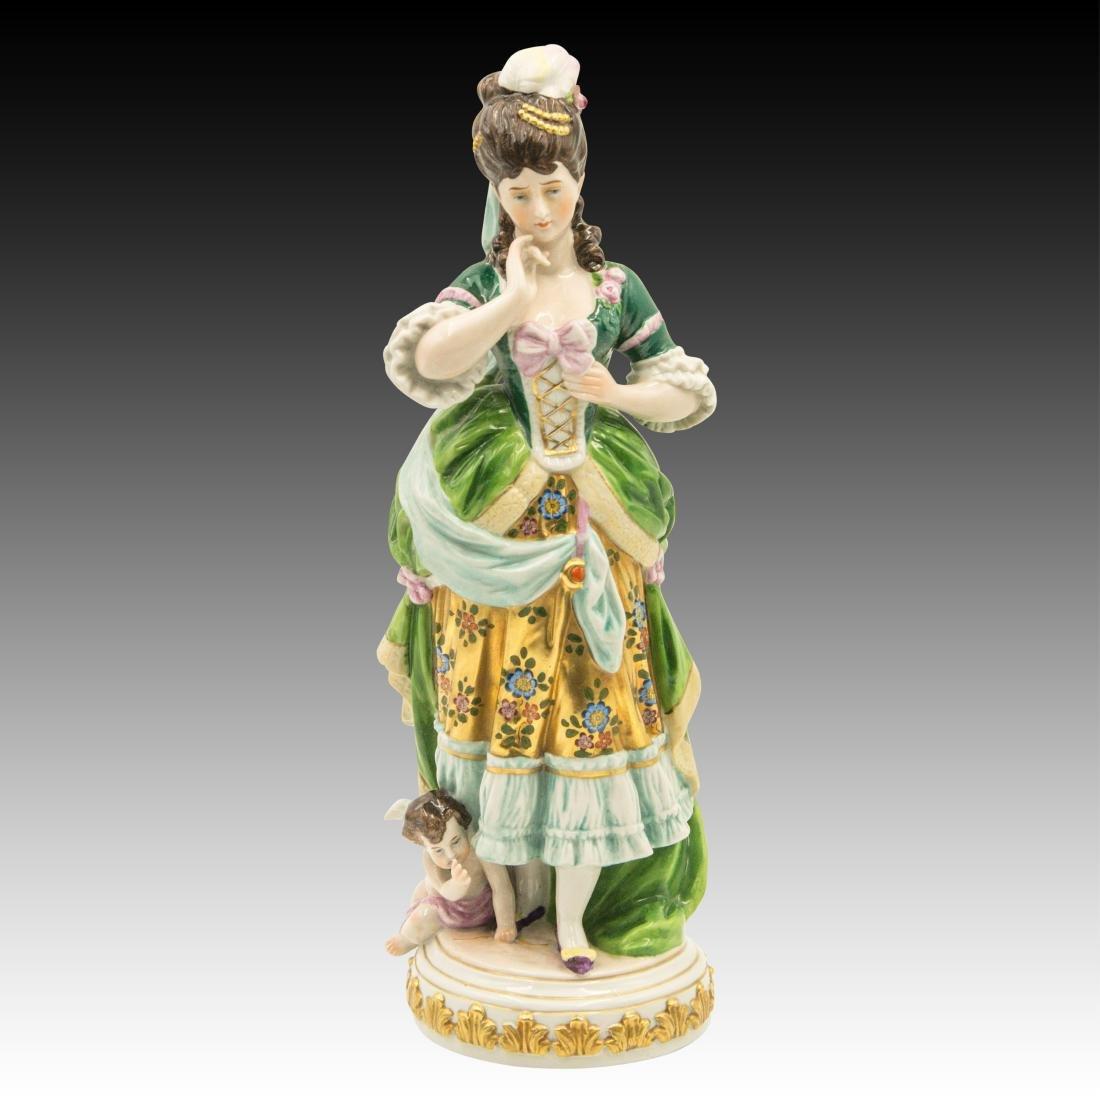 Colorful Kaiser Period Figurine with Cherub